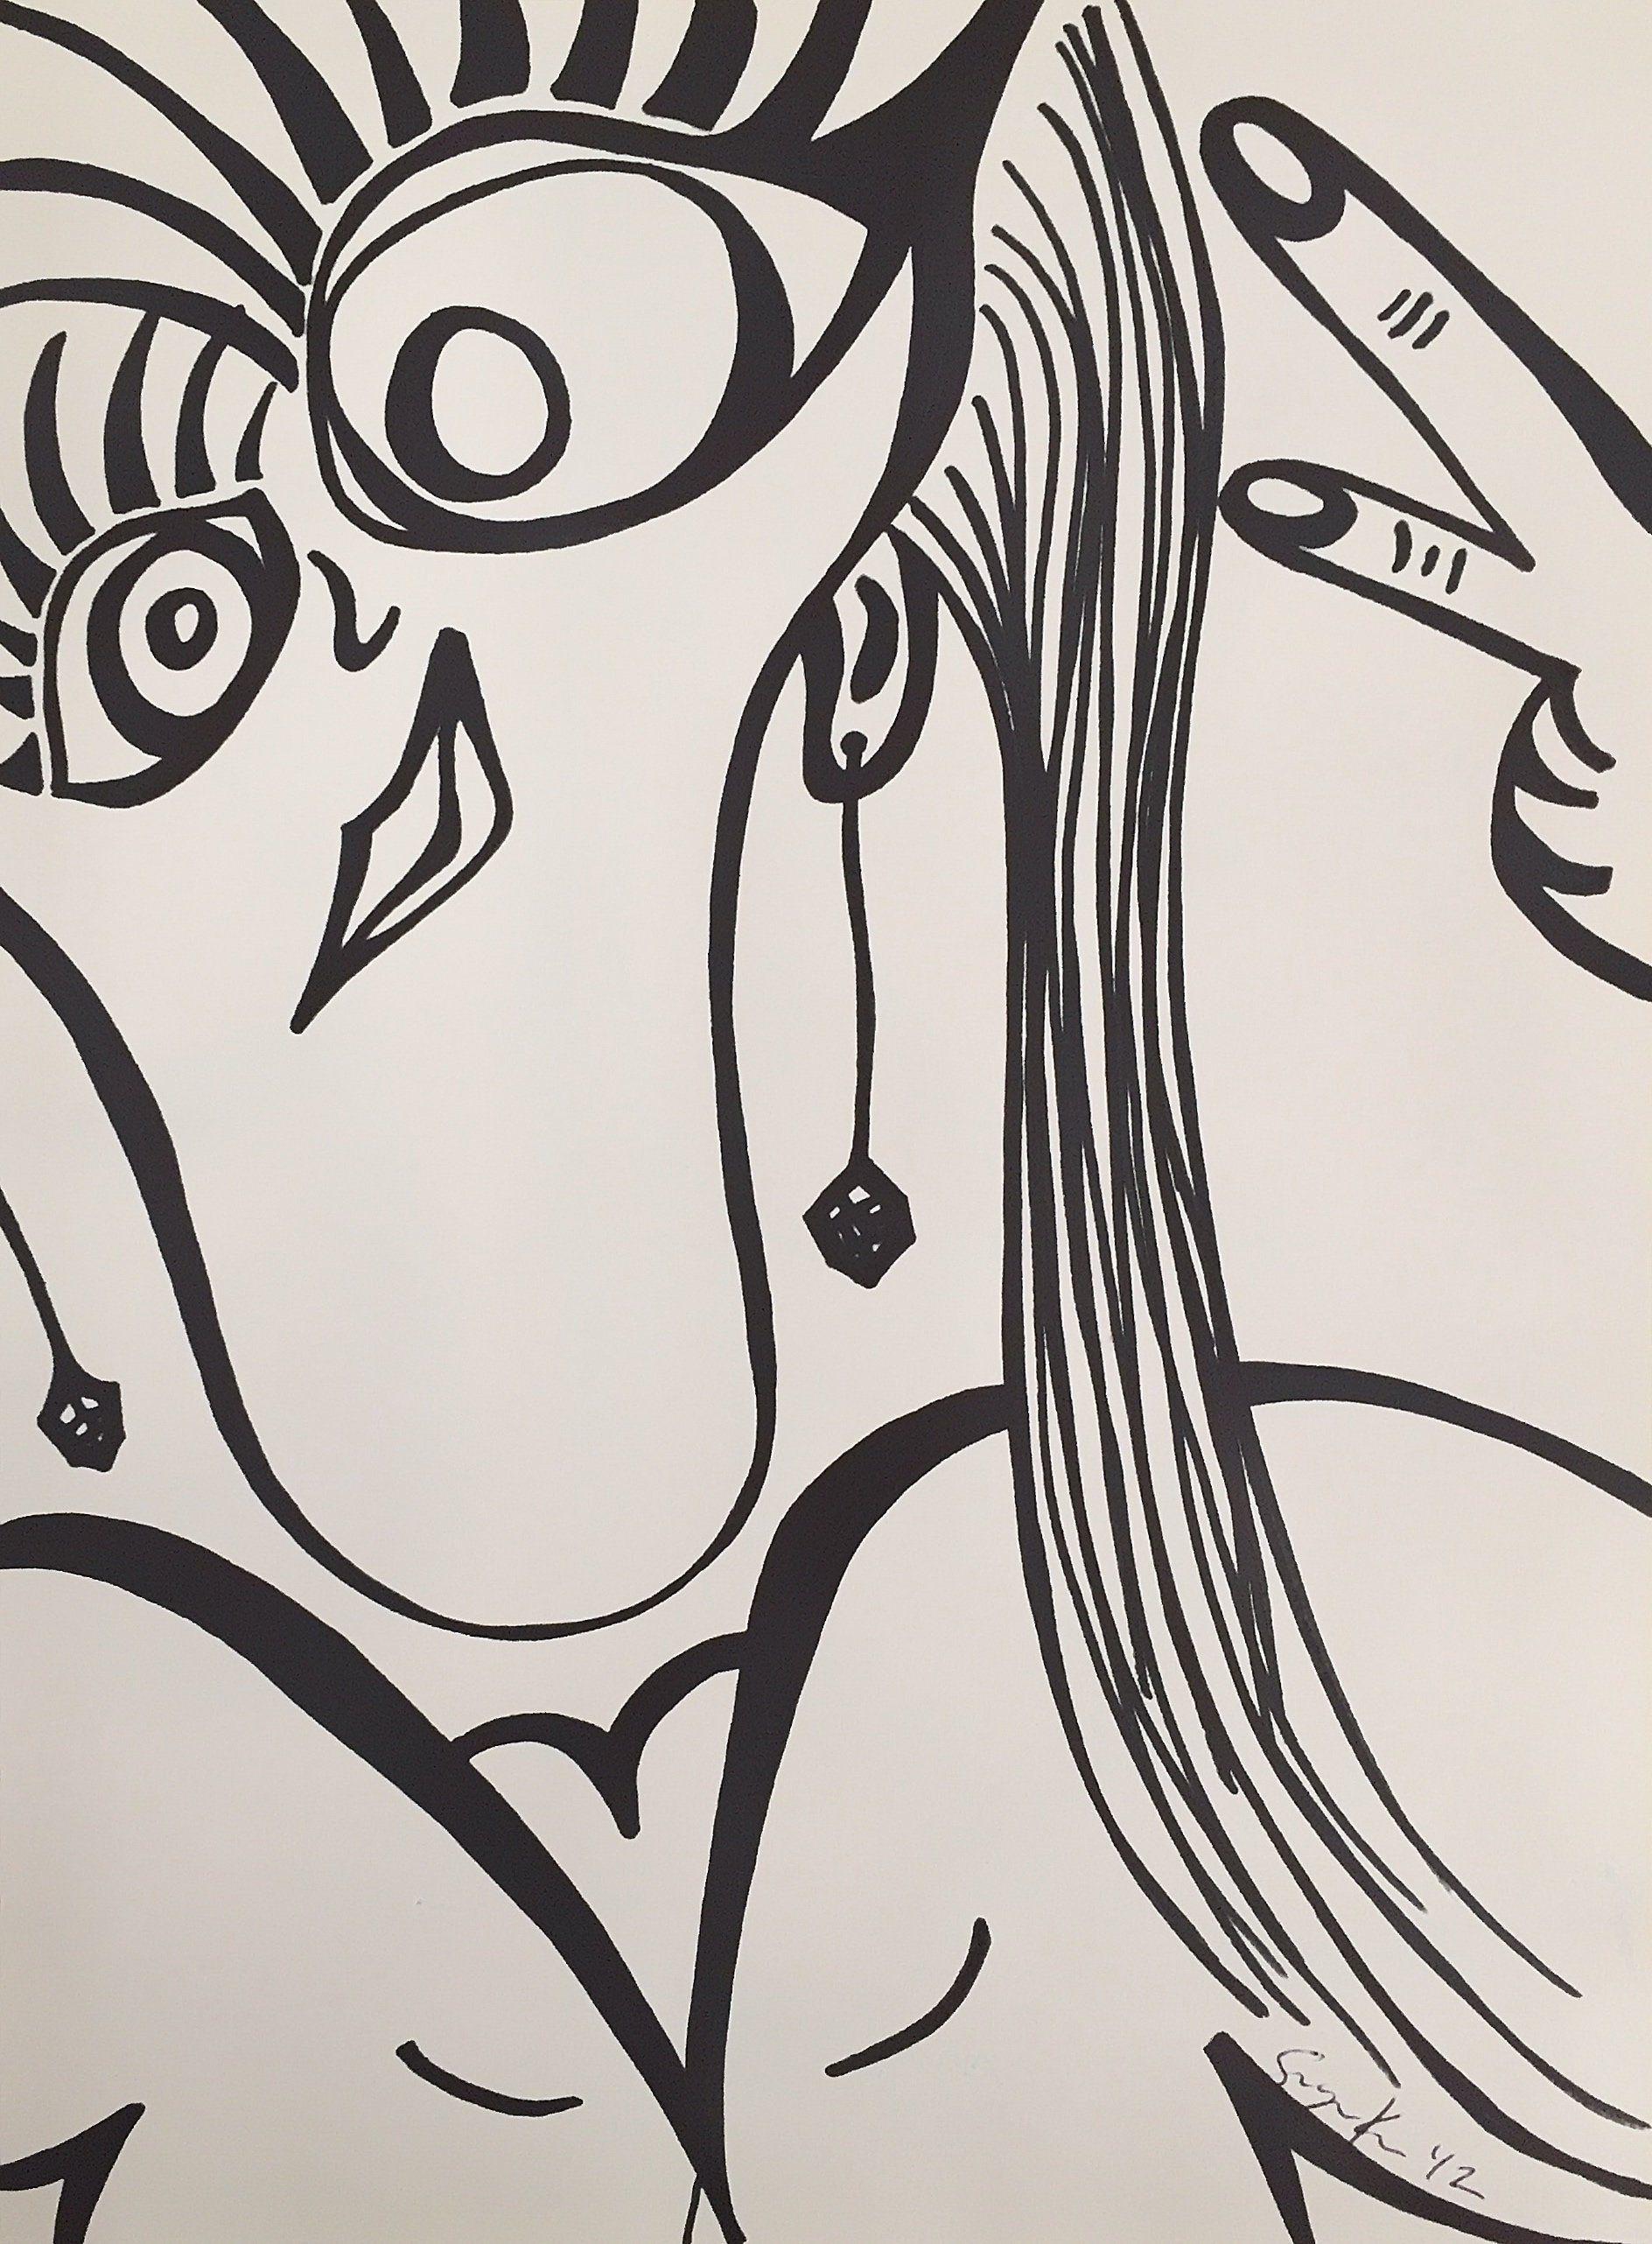 Character Drawings Marker Drawing Artwork Abstract Art